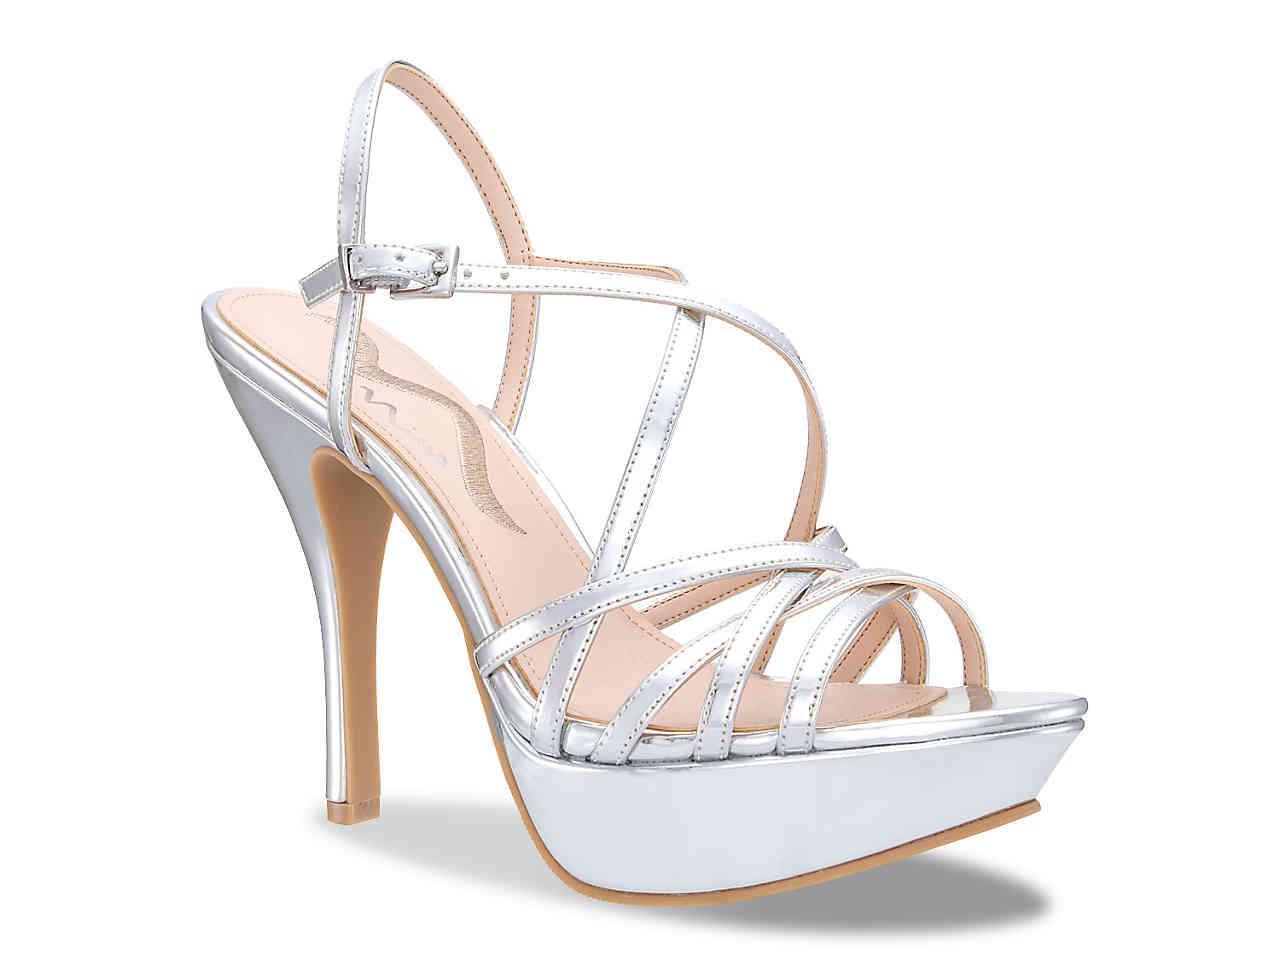 92af4261f36 Lyst - Nina Jerolyn Platform Sandal in Metallic